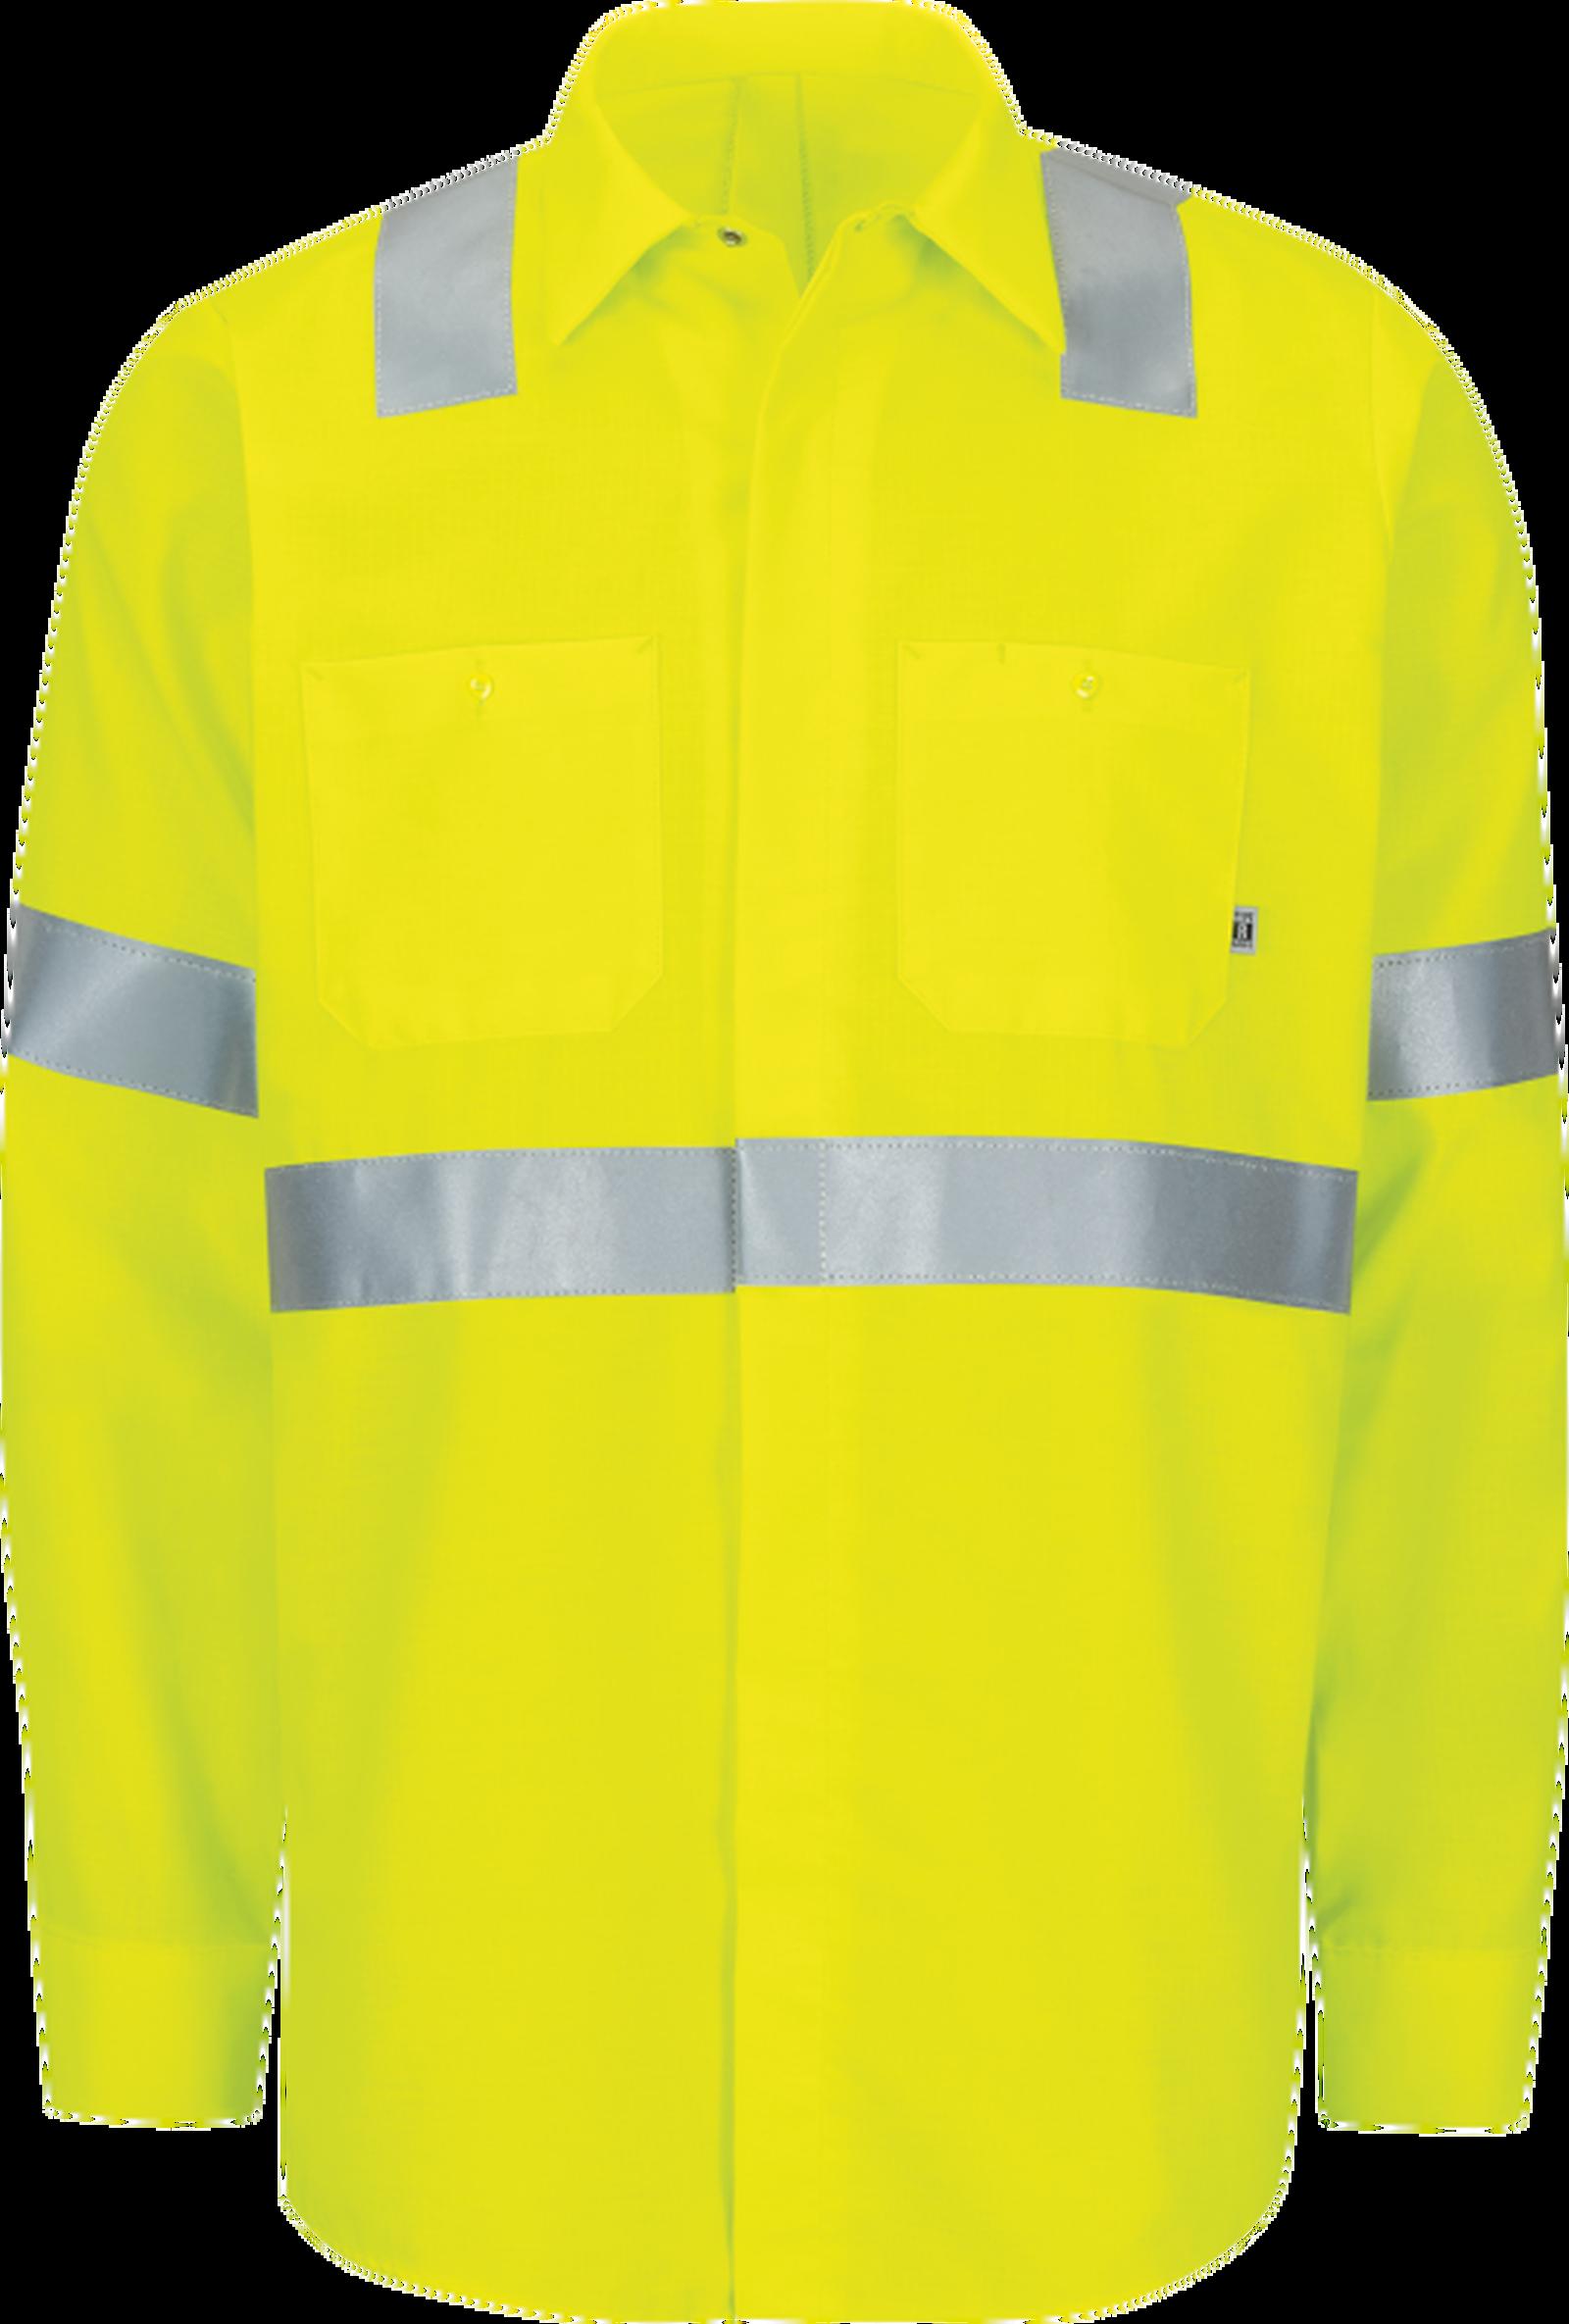 Long Sleeve Hi-Visibility Ripstop Work Shirt with MIMIX™ + OilBlok, Type R Class 2